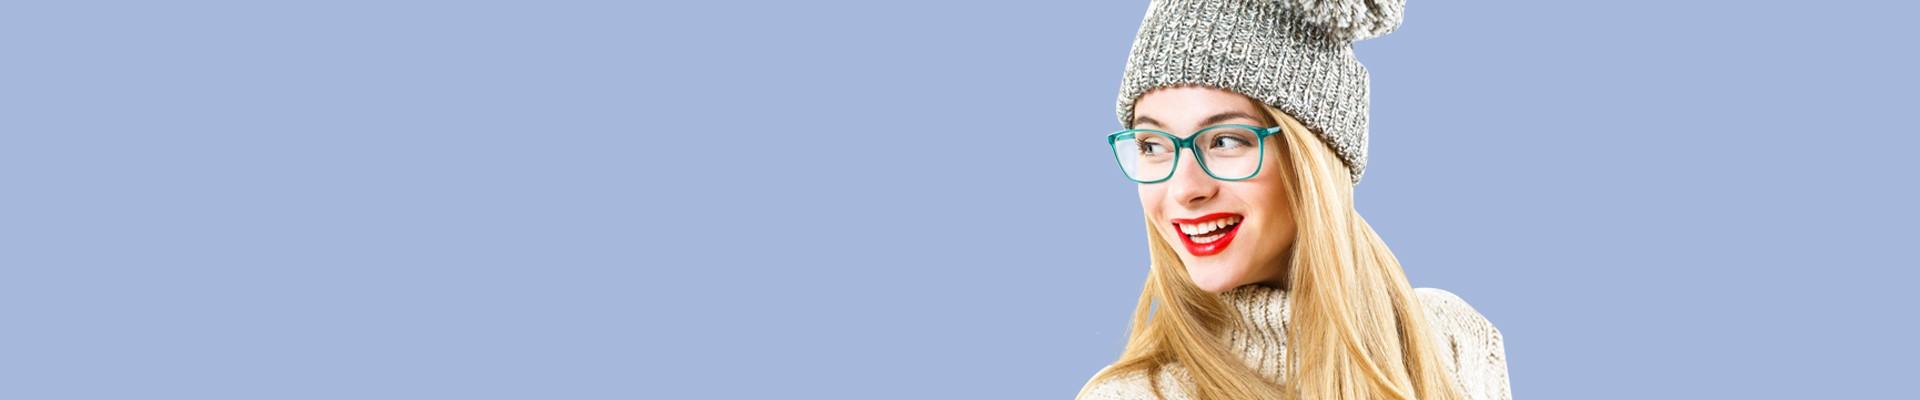 Jual Frame Kacamata Wanita Model Terbaru  205661858f